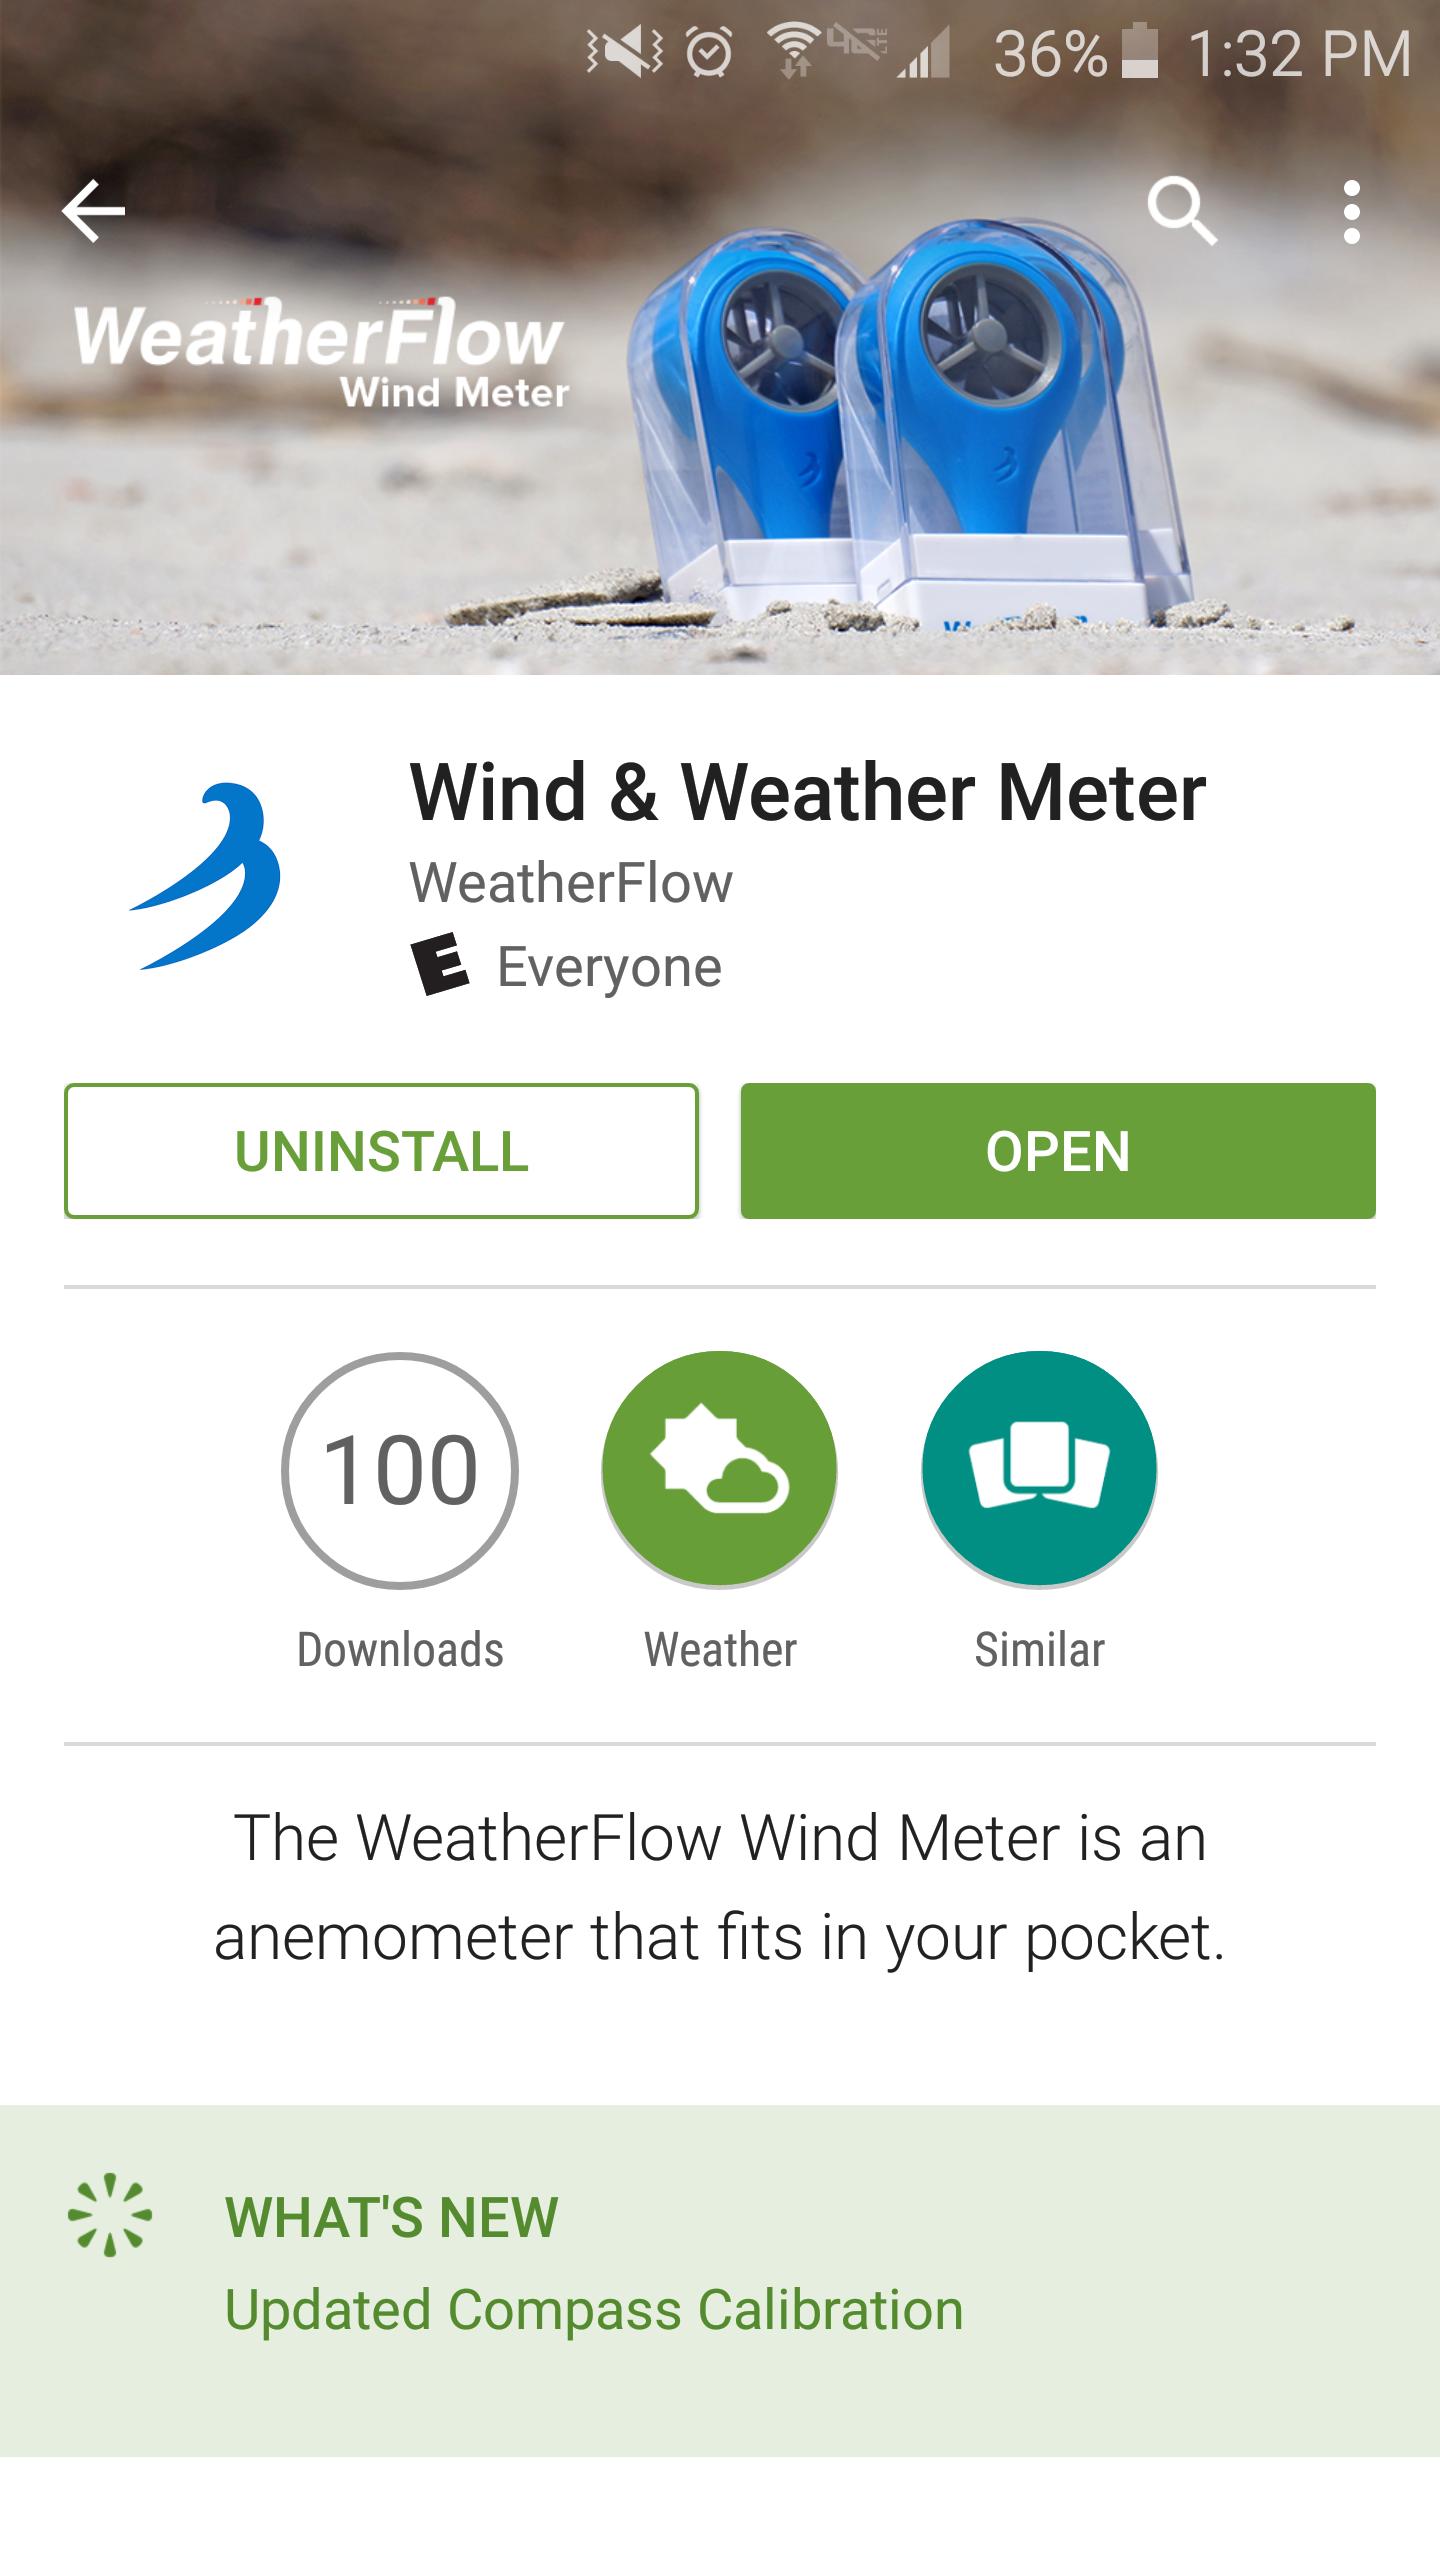 weatherflow wind meter instructions